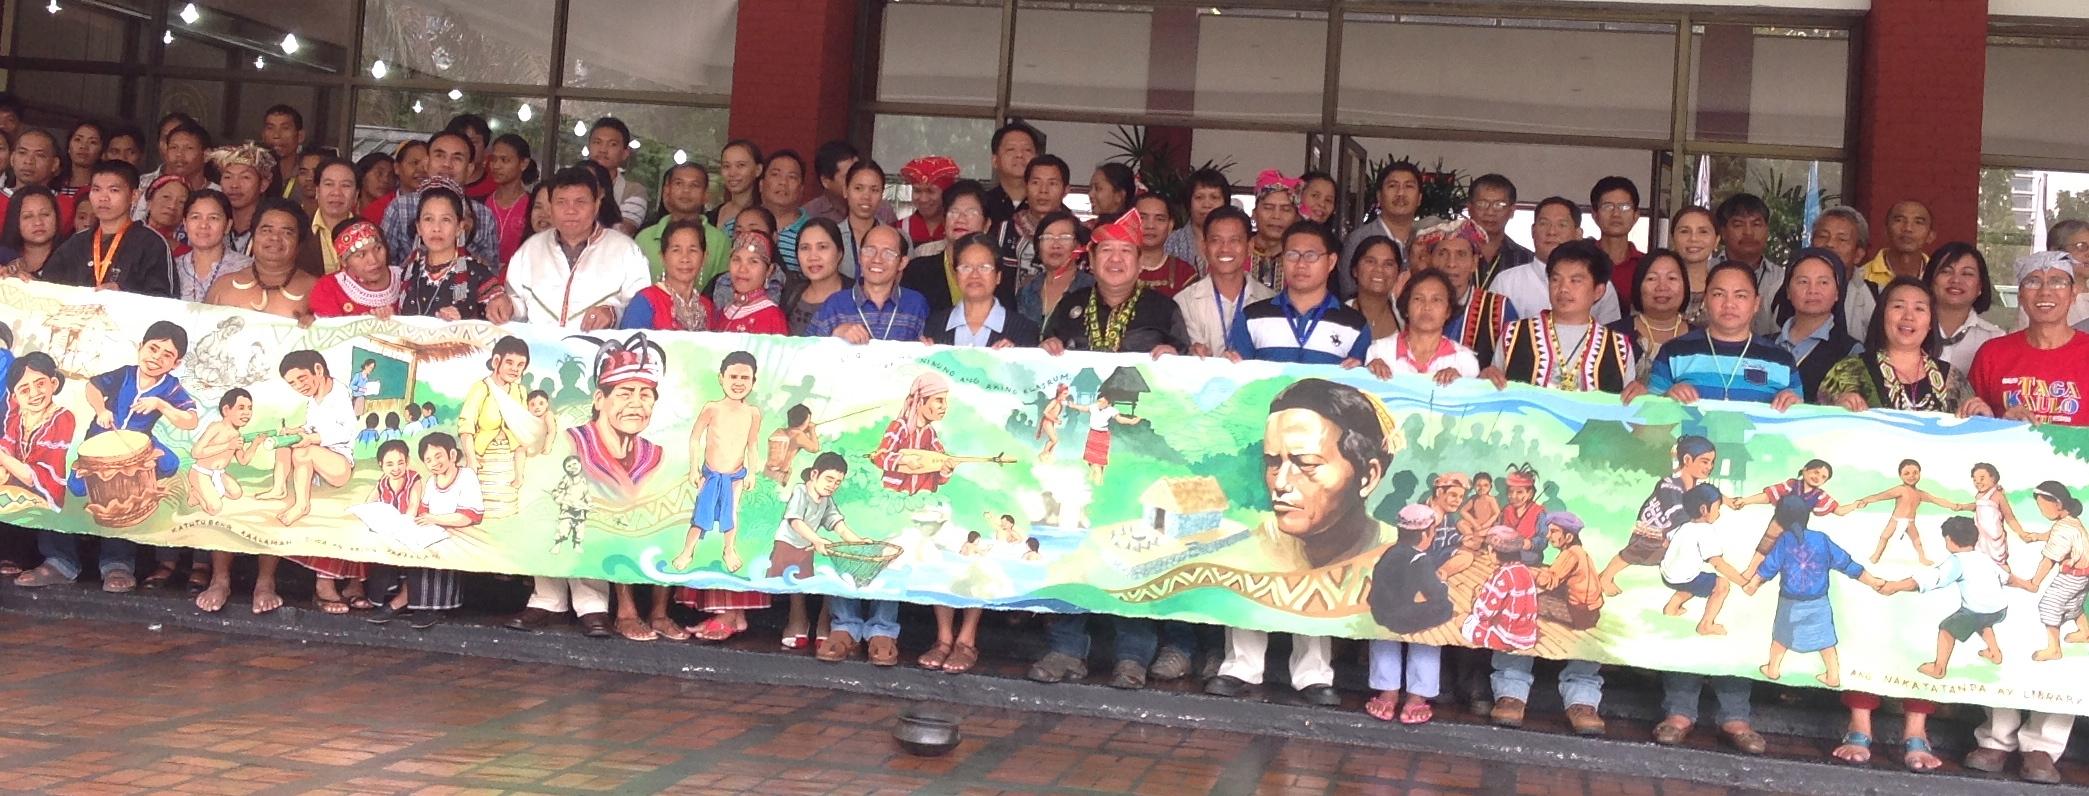 Linkage: IPEd gathering in Manila, Oct 2013